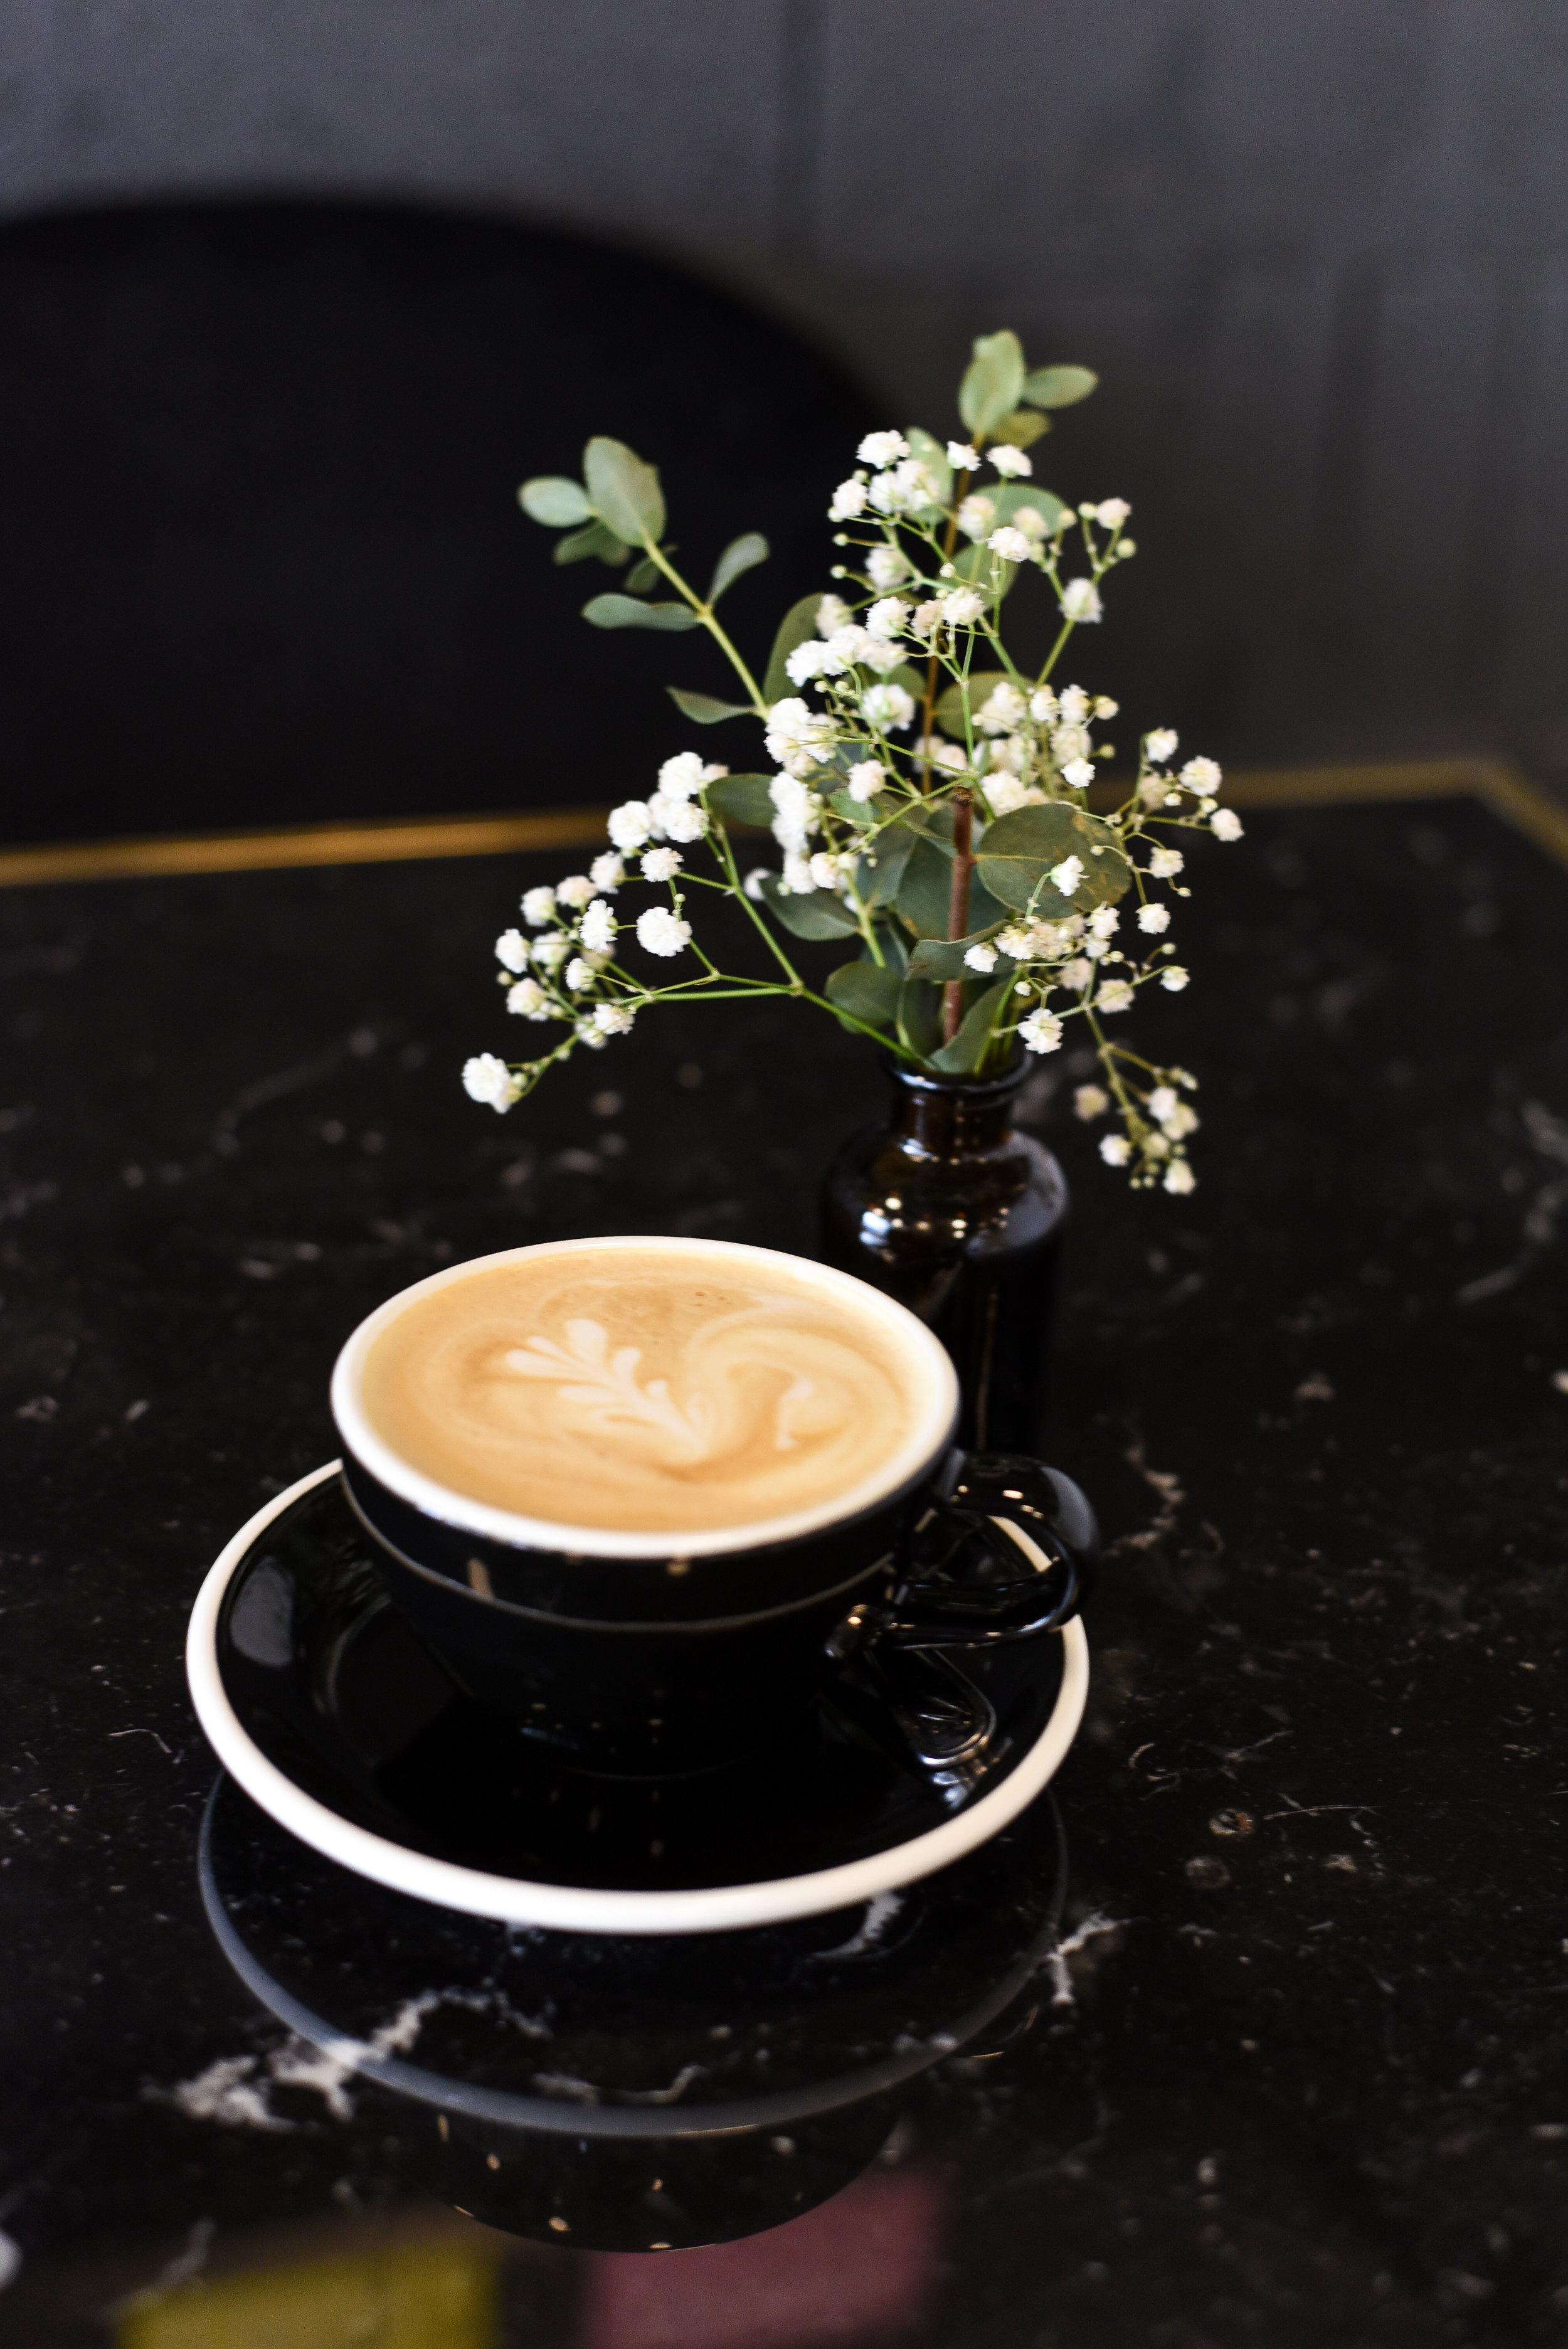 twinky-lizzy-blog-aix-en-provence-cafe-du-temps-restaurant-vegan-4.jpg